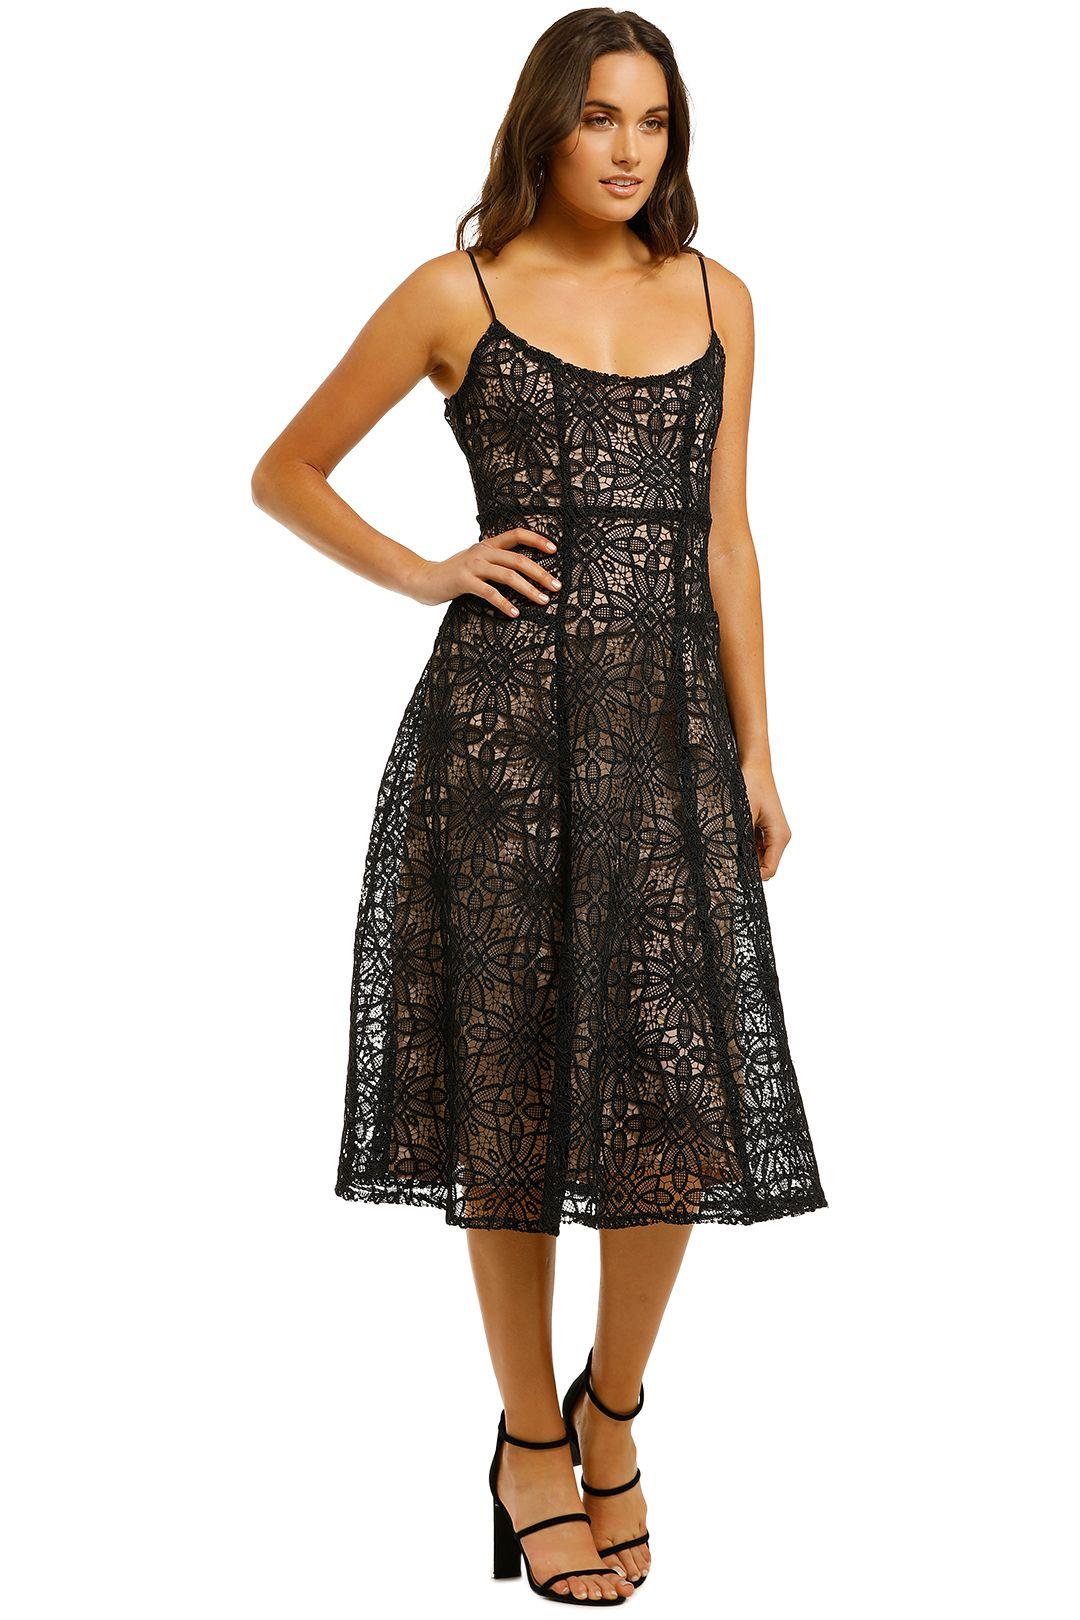 Misha-Marzia-Dress-Black-Side